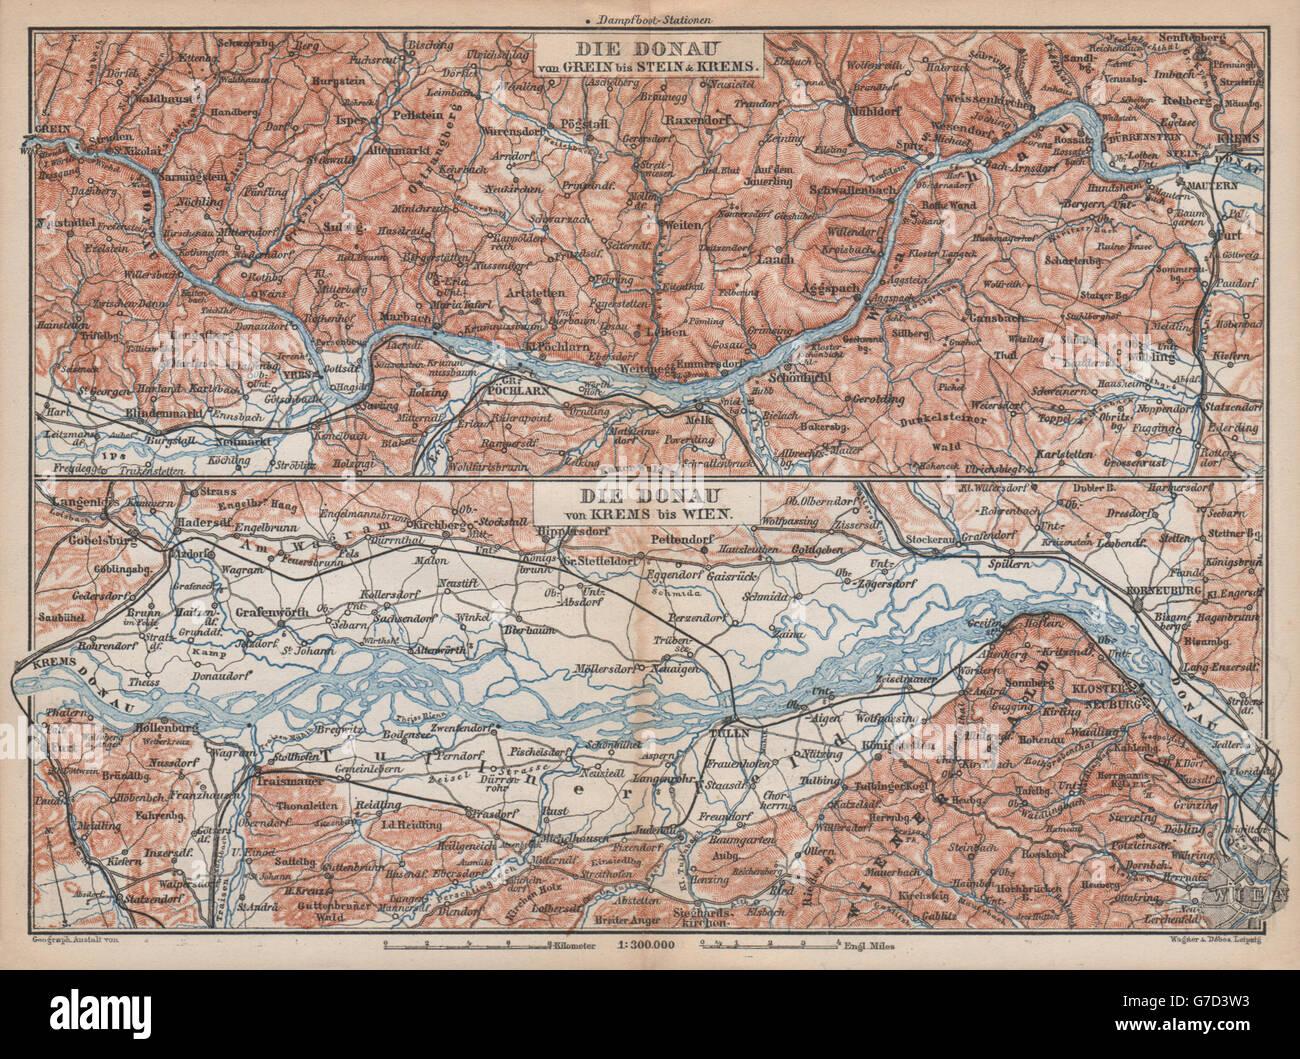 Krems Austria Map on lower austria, wien austria map, austria rail map, gmund austria map, grossglockner austria map, danube university krems, brussels austria map, althofen austria map, linz austria map, wiener neustadt austria map, budapest austria map, maria theresa of austria map, villach austria map, zell am see austria map, rohrau austria map, bregenz austria map, wiener neustadt, strasbourg austria map, eisenstadt austria map, ybbs an der donau, graz austria map, salzburg austria map, ternitz austria map, durnstein austria map,